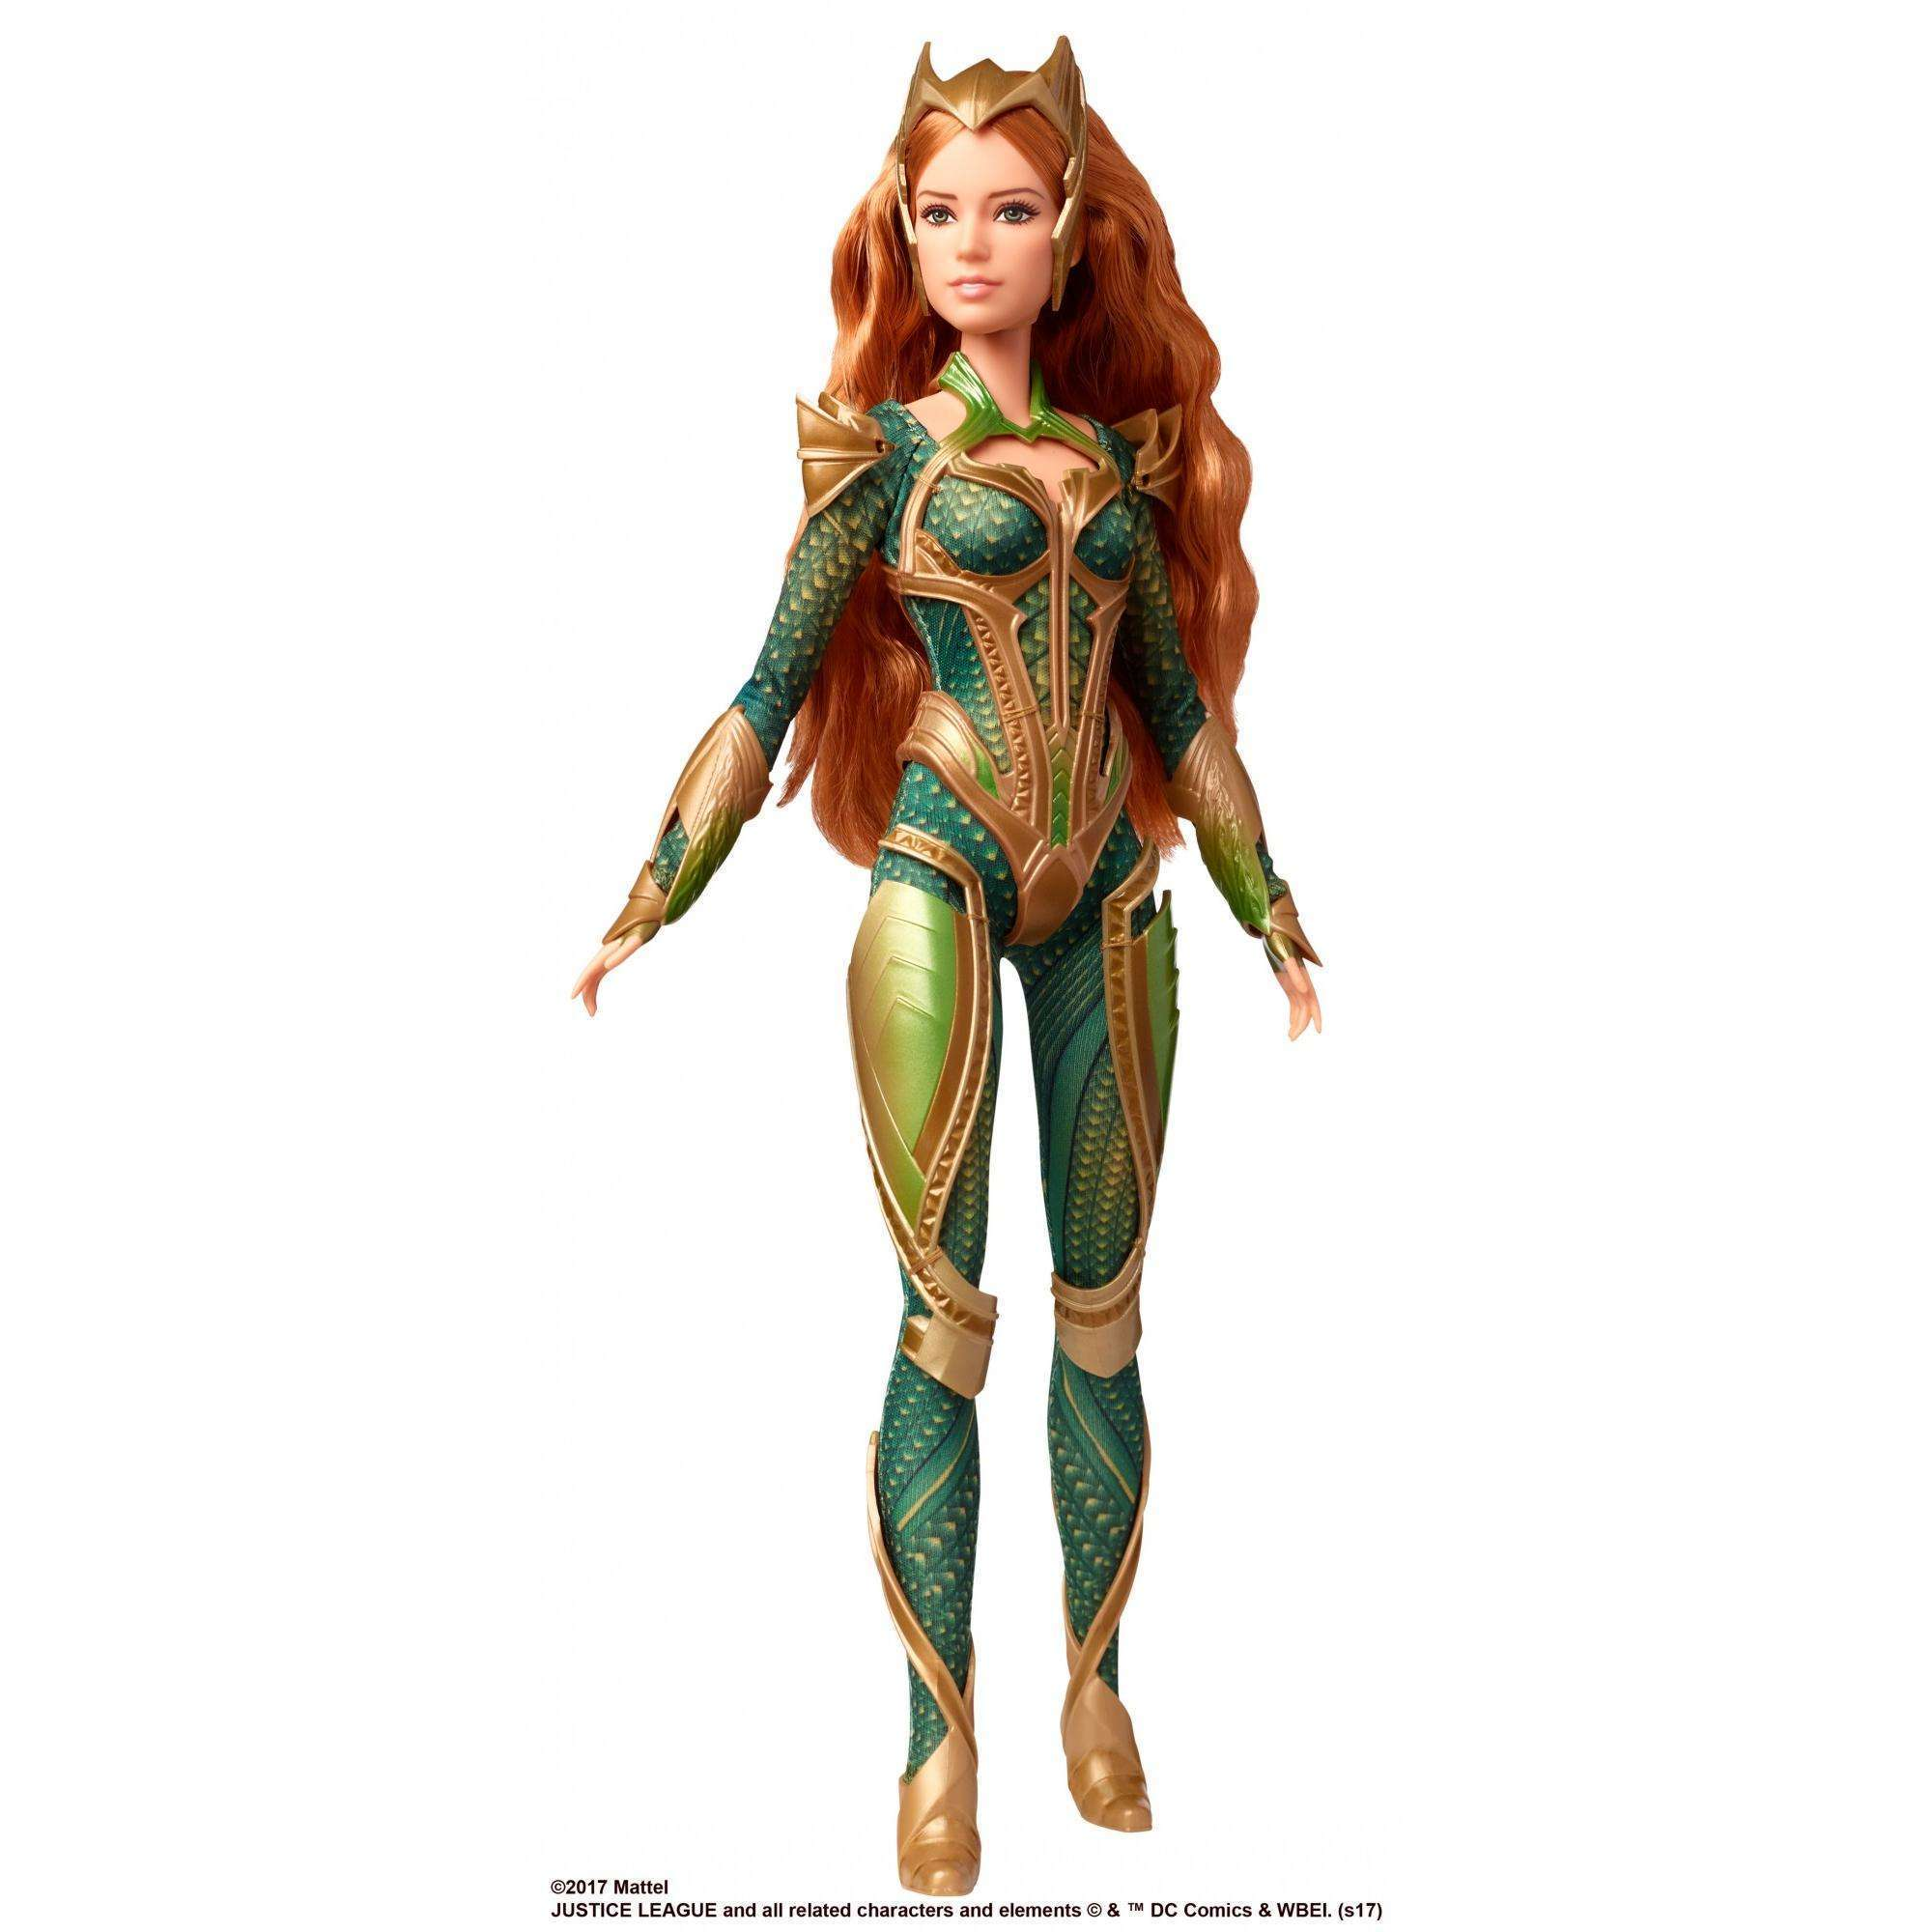 Barbie Justice League Undersea Warrior Princess Mera Doll